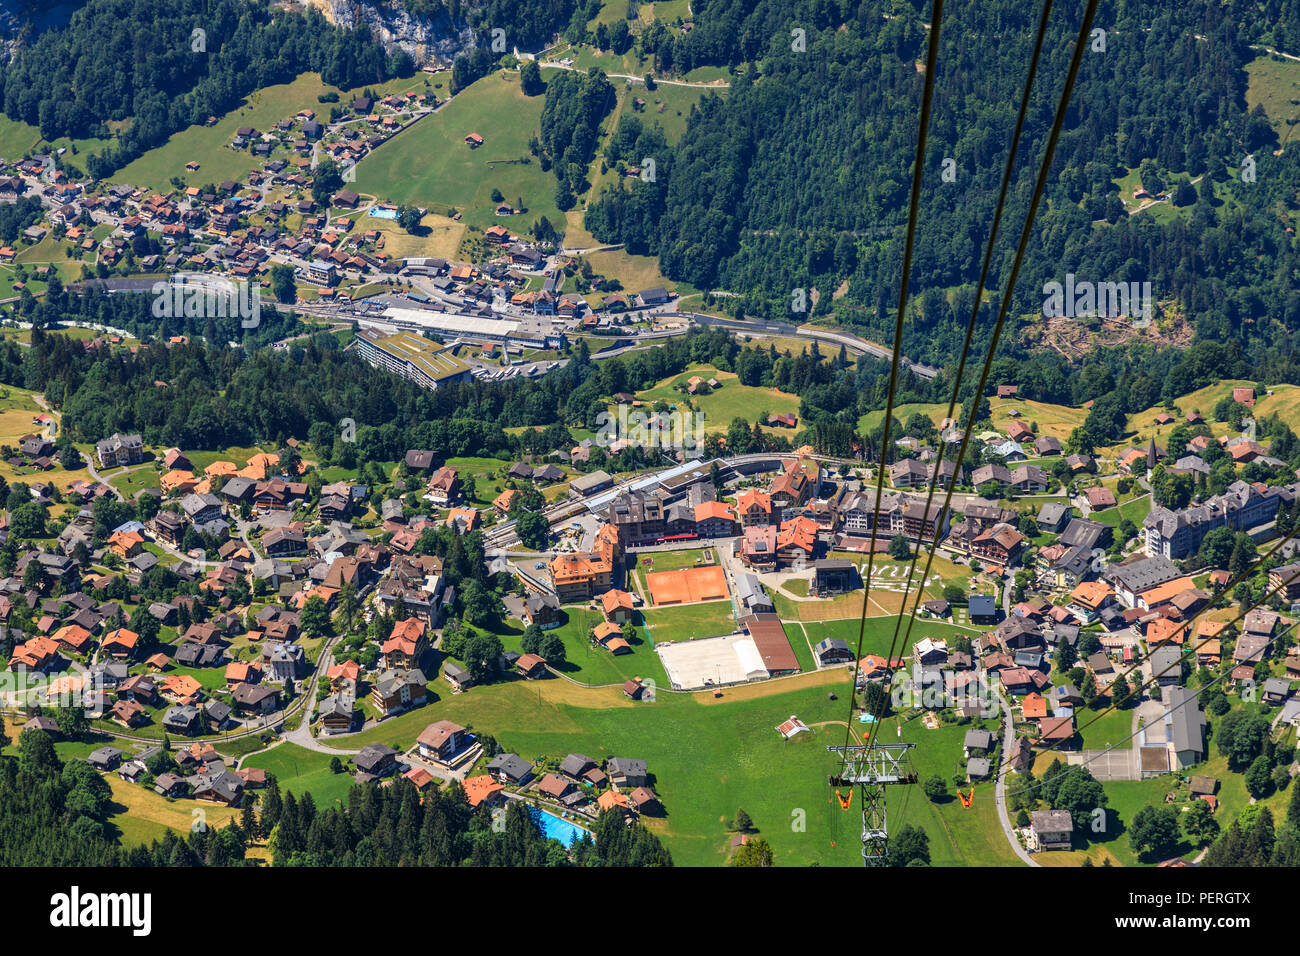 Aerial view of Wengen village centre, Lauterbrunnen and the Lauterbrunnen Valley from the Maennlichen cablecar, Jungfrau region, Switzerland - Stock Image